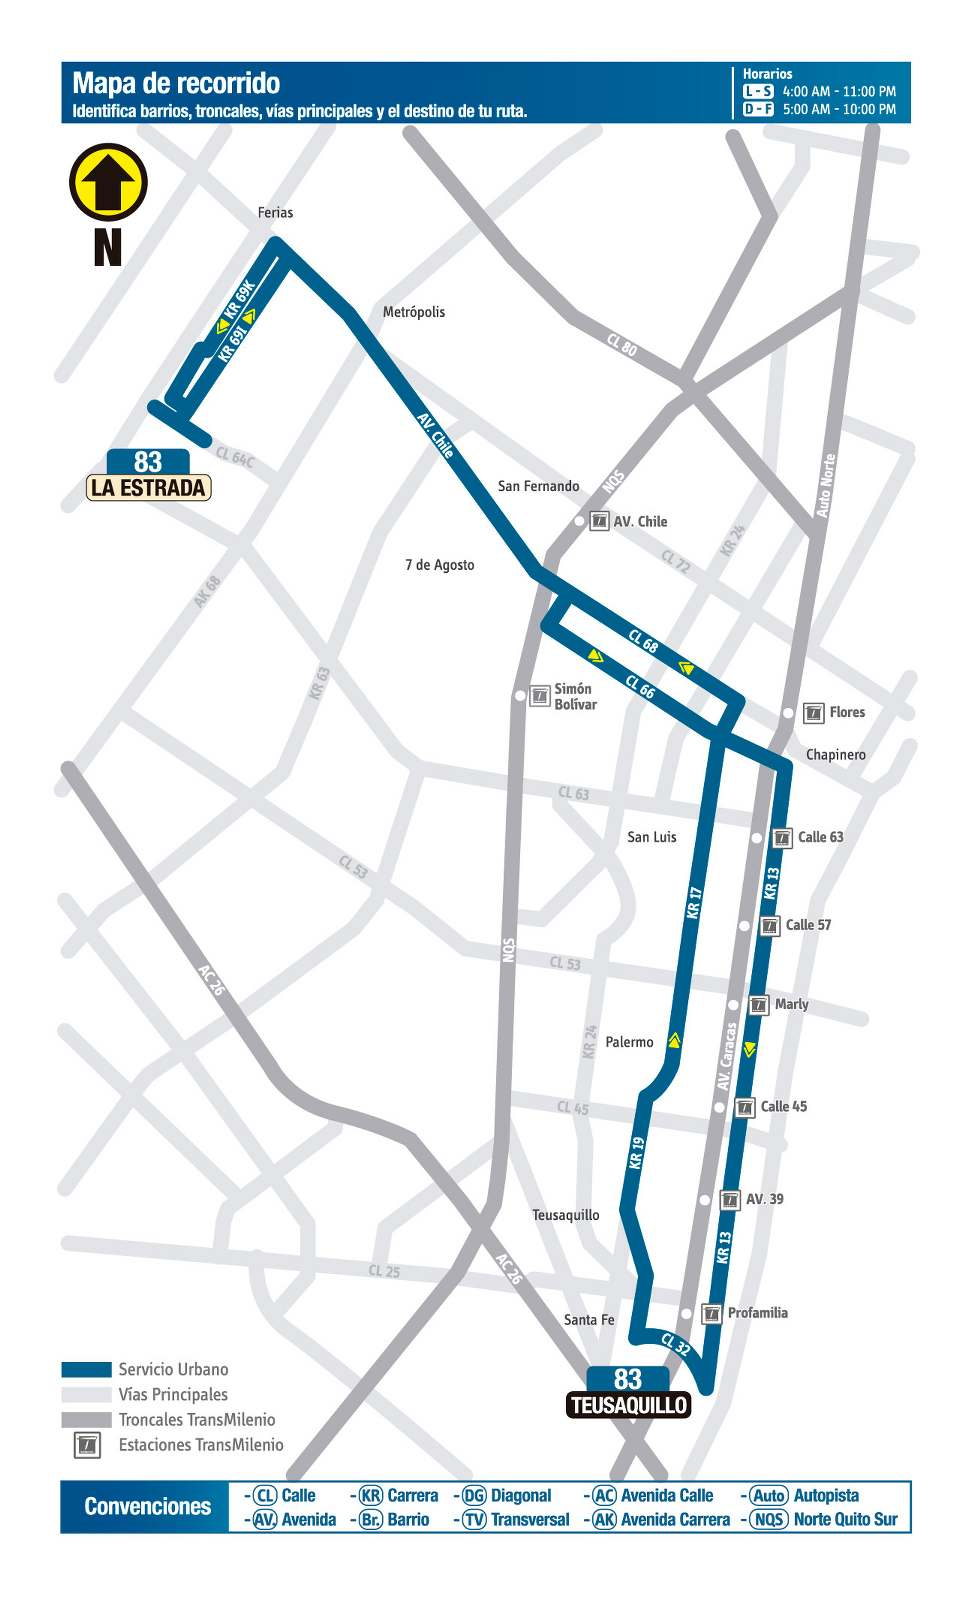 Ruta SITP: 83 La Estrada ↔ Paloquemao (mapa)